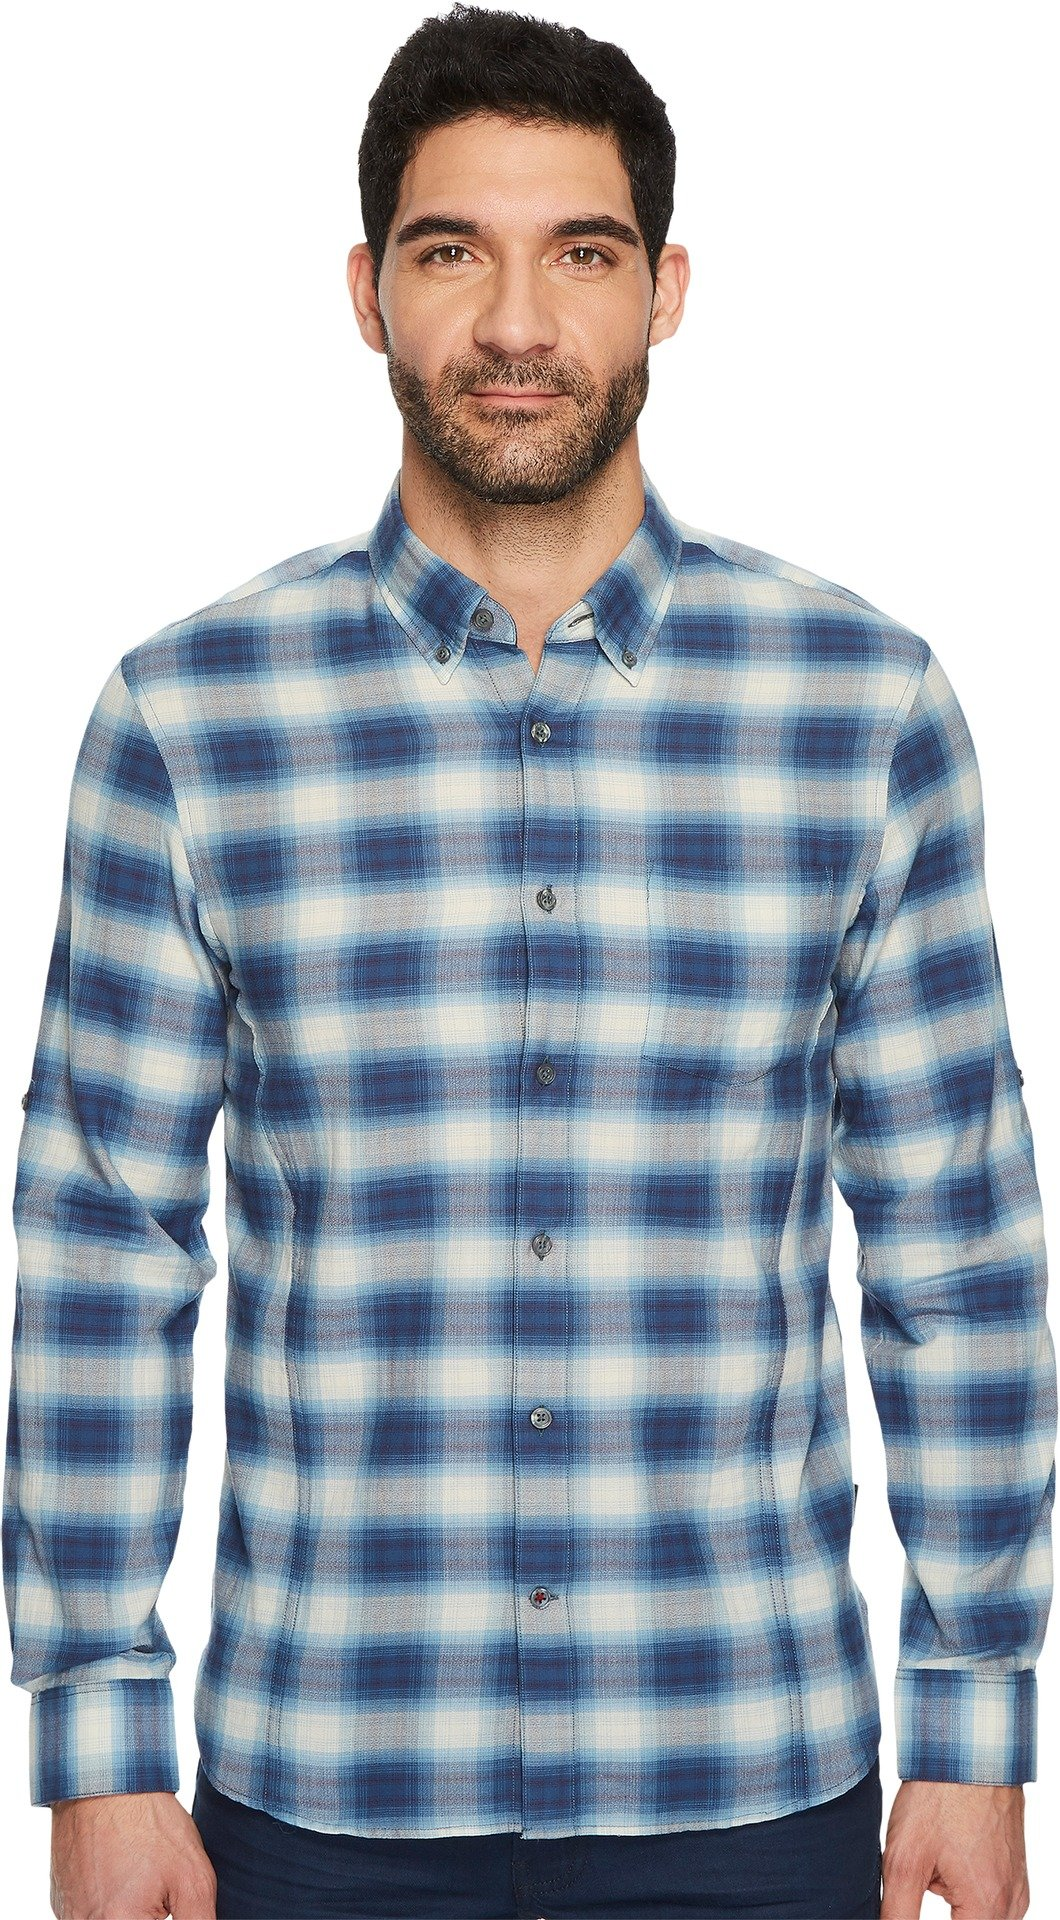 John Varvatos Star U.S.A. Men's Button Down Short Sleeve Roll-Up Shirt w/Single Pocket Sky Medium